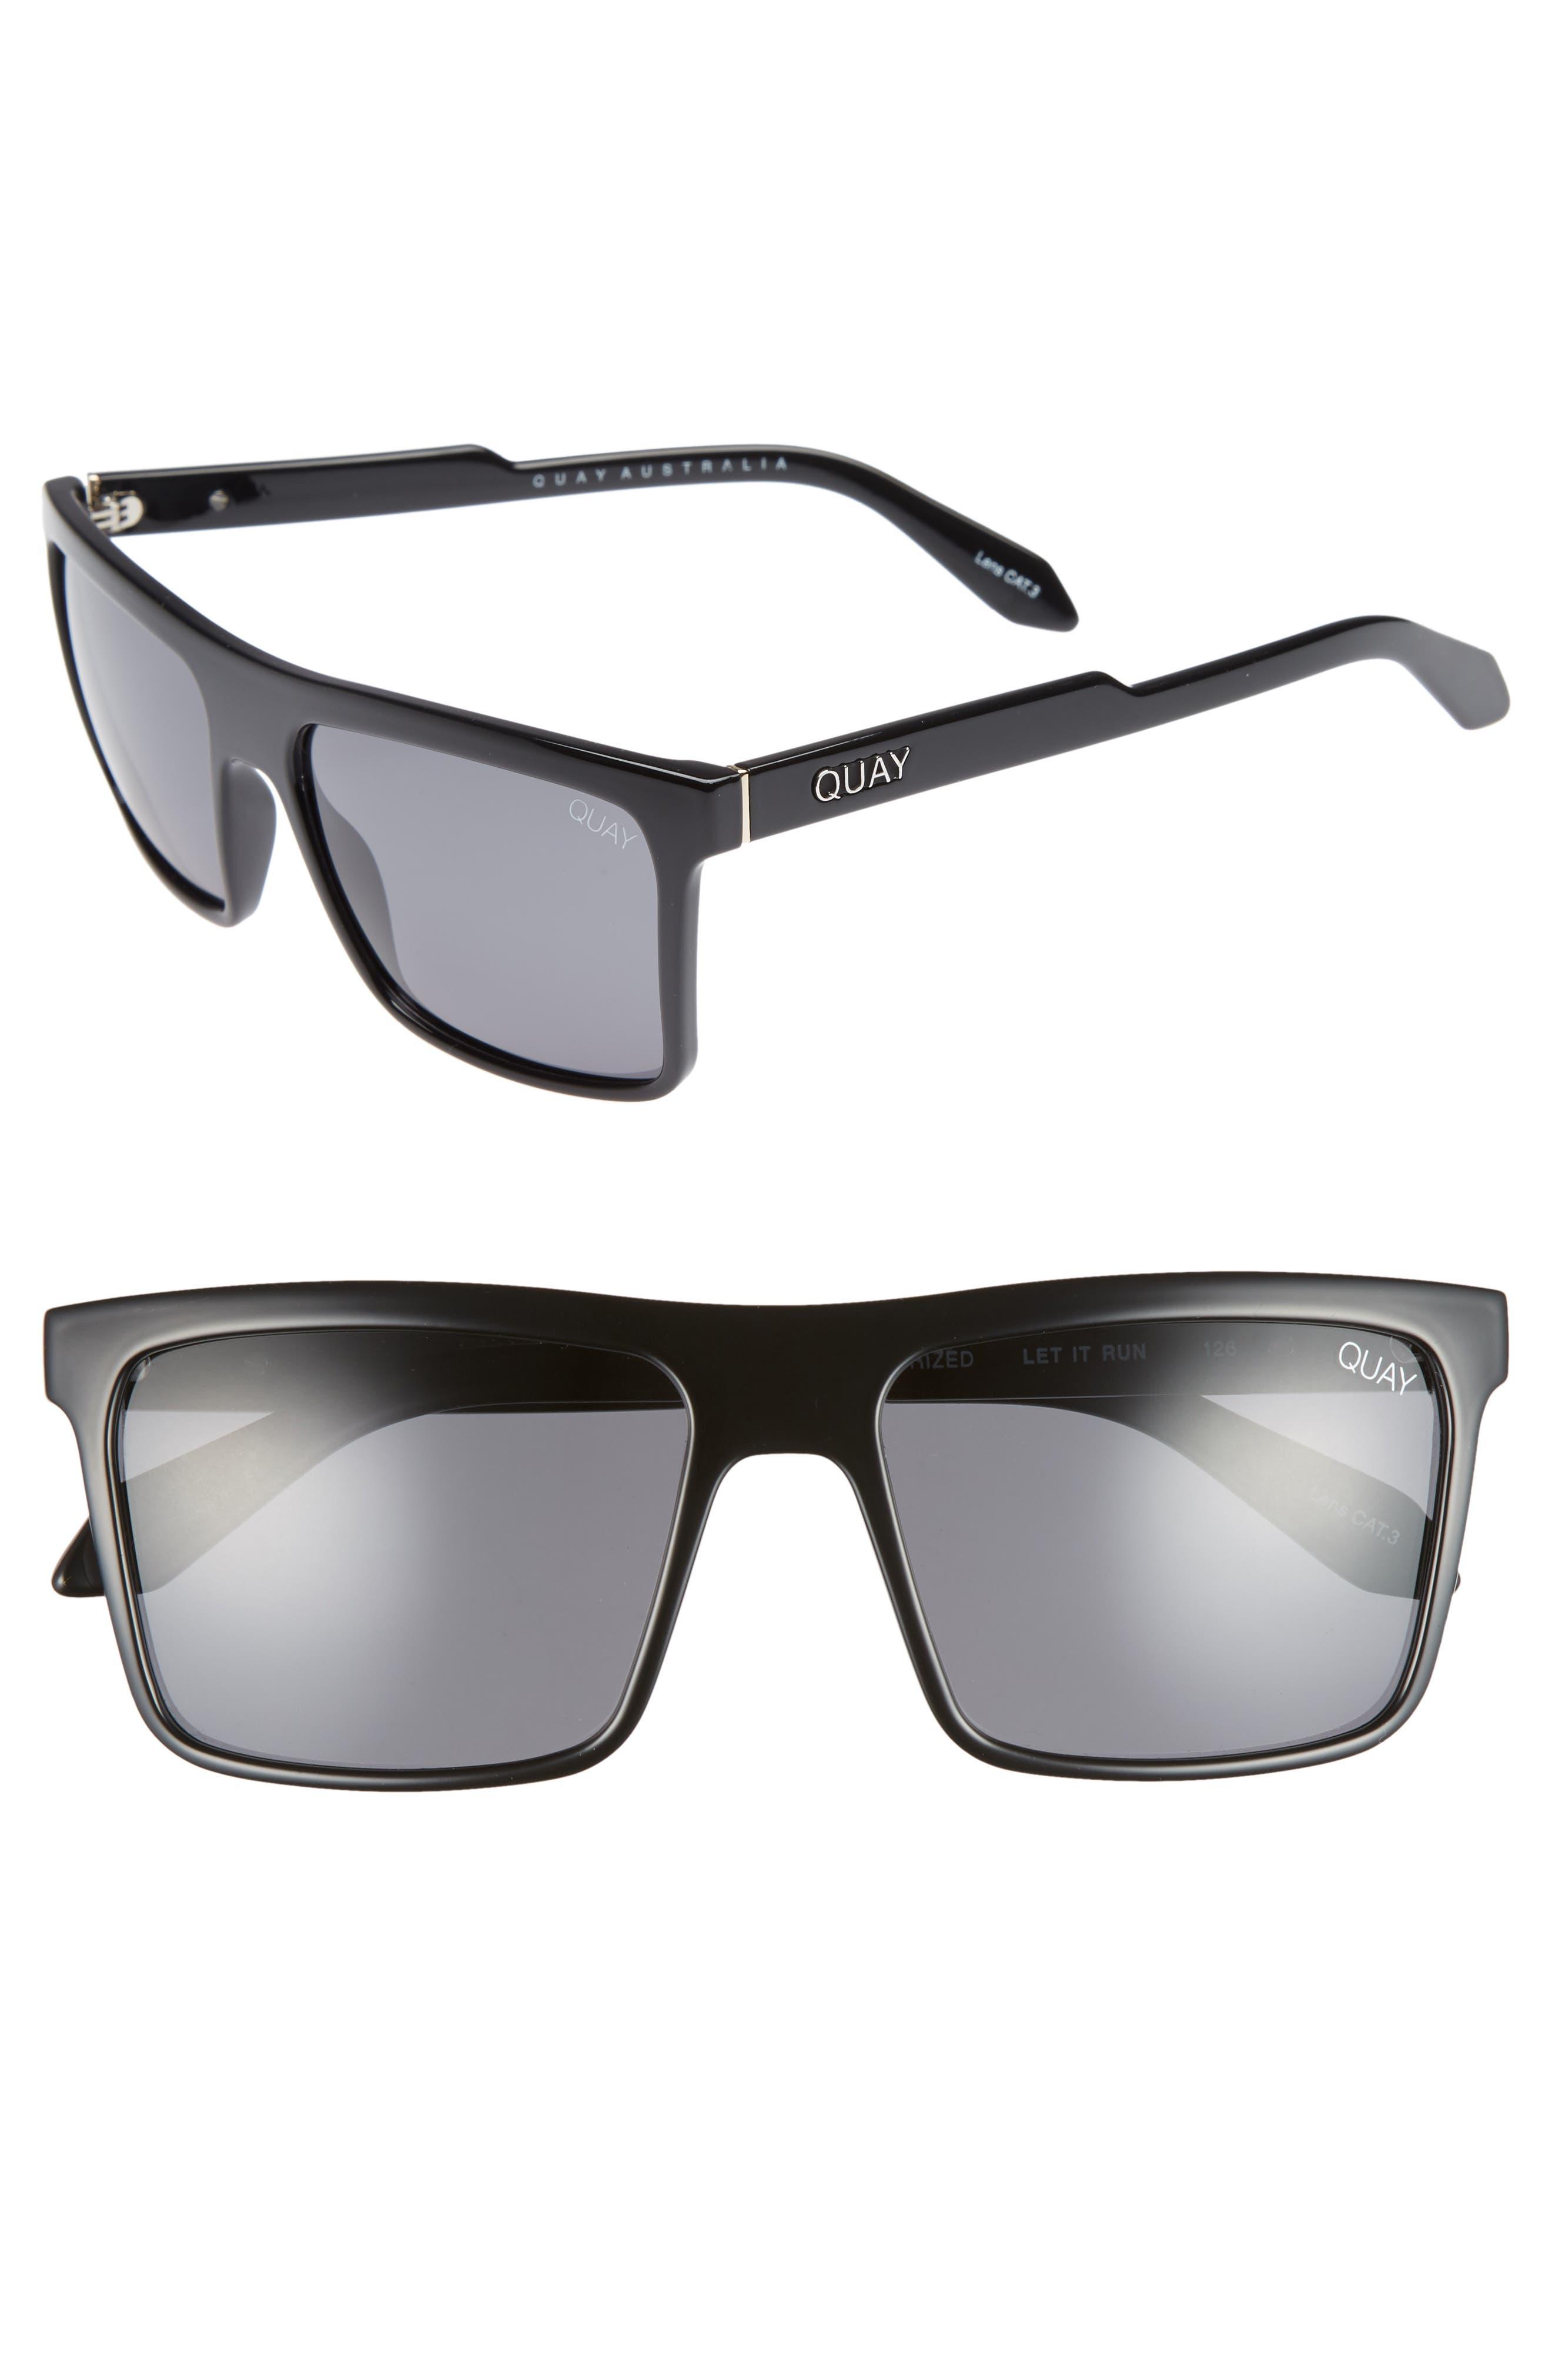 Let It Run 57mm Polarized Sunglasses, Main, color, BLACK / SMOKE LENS